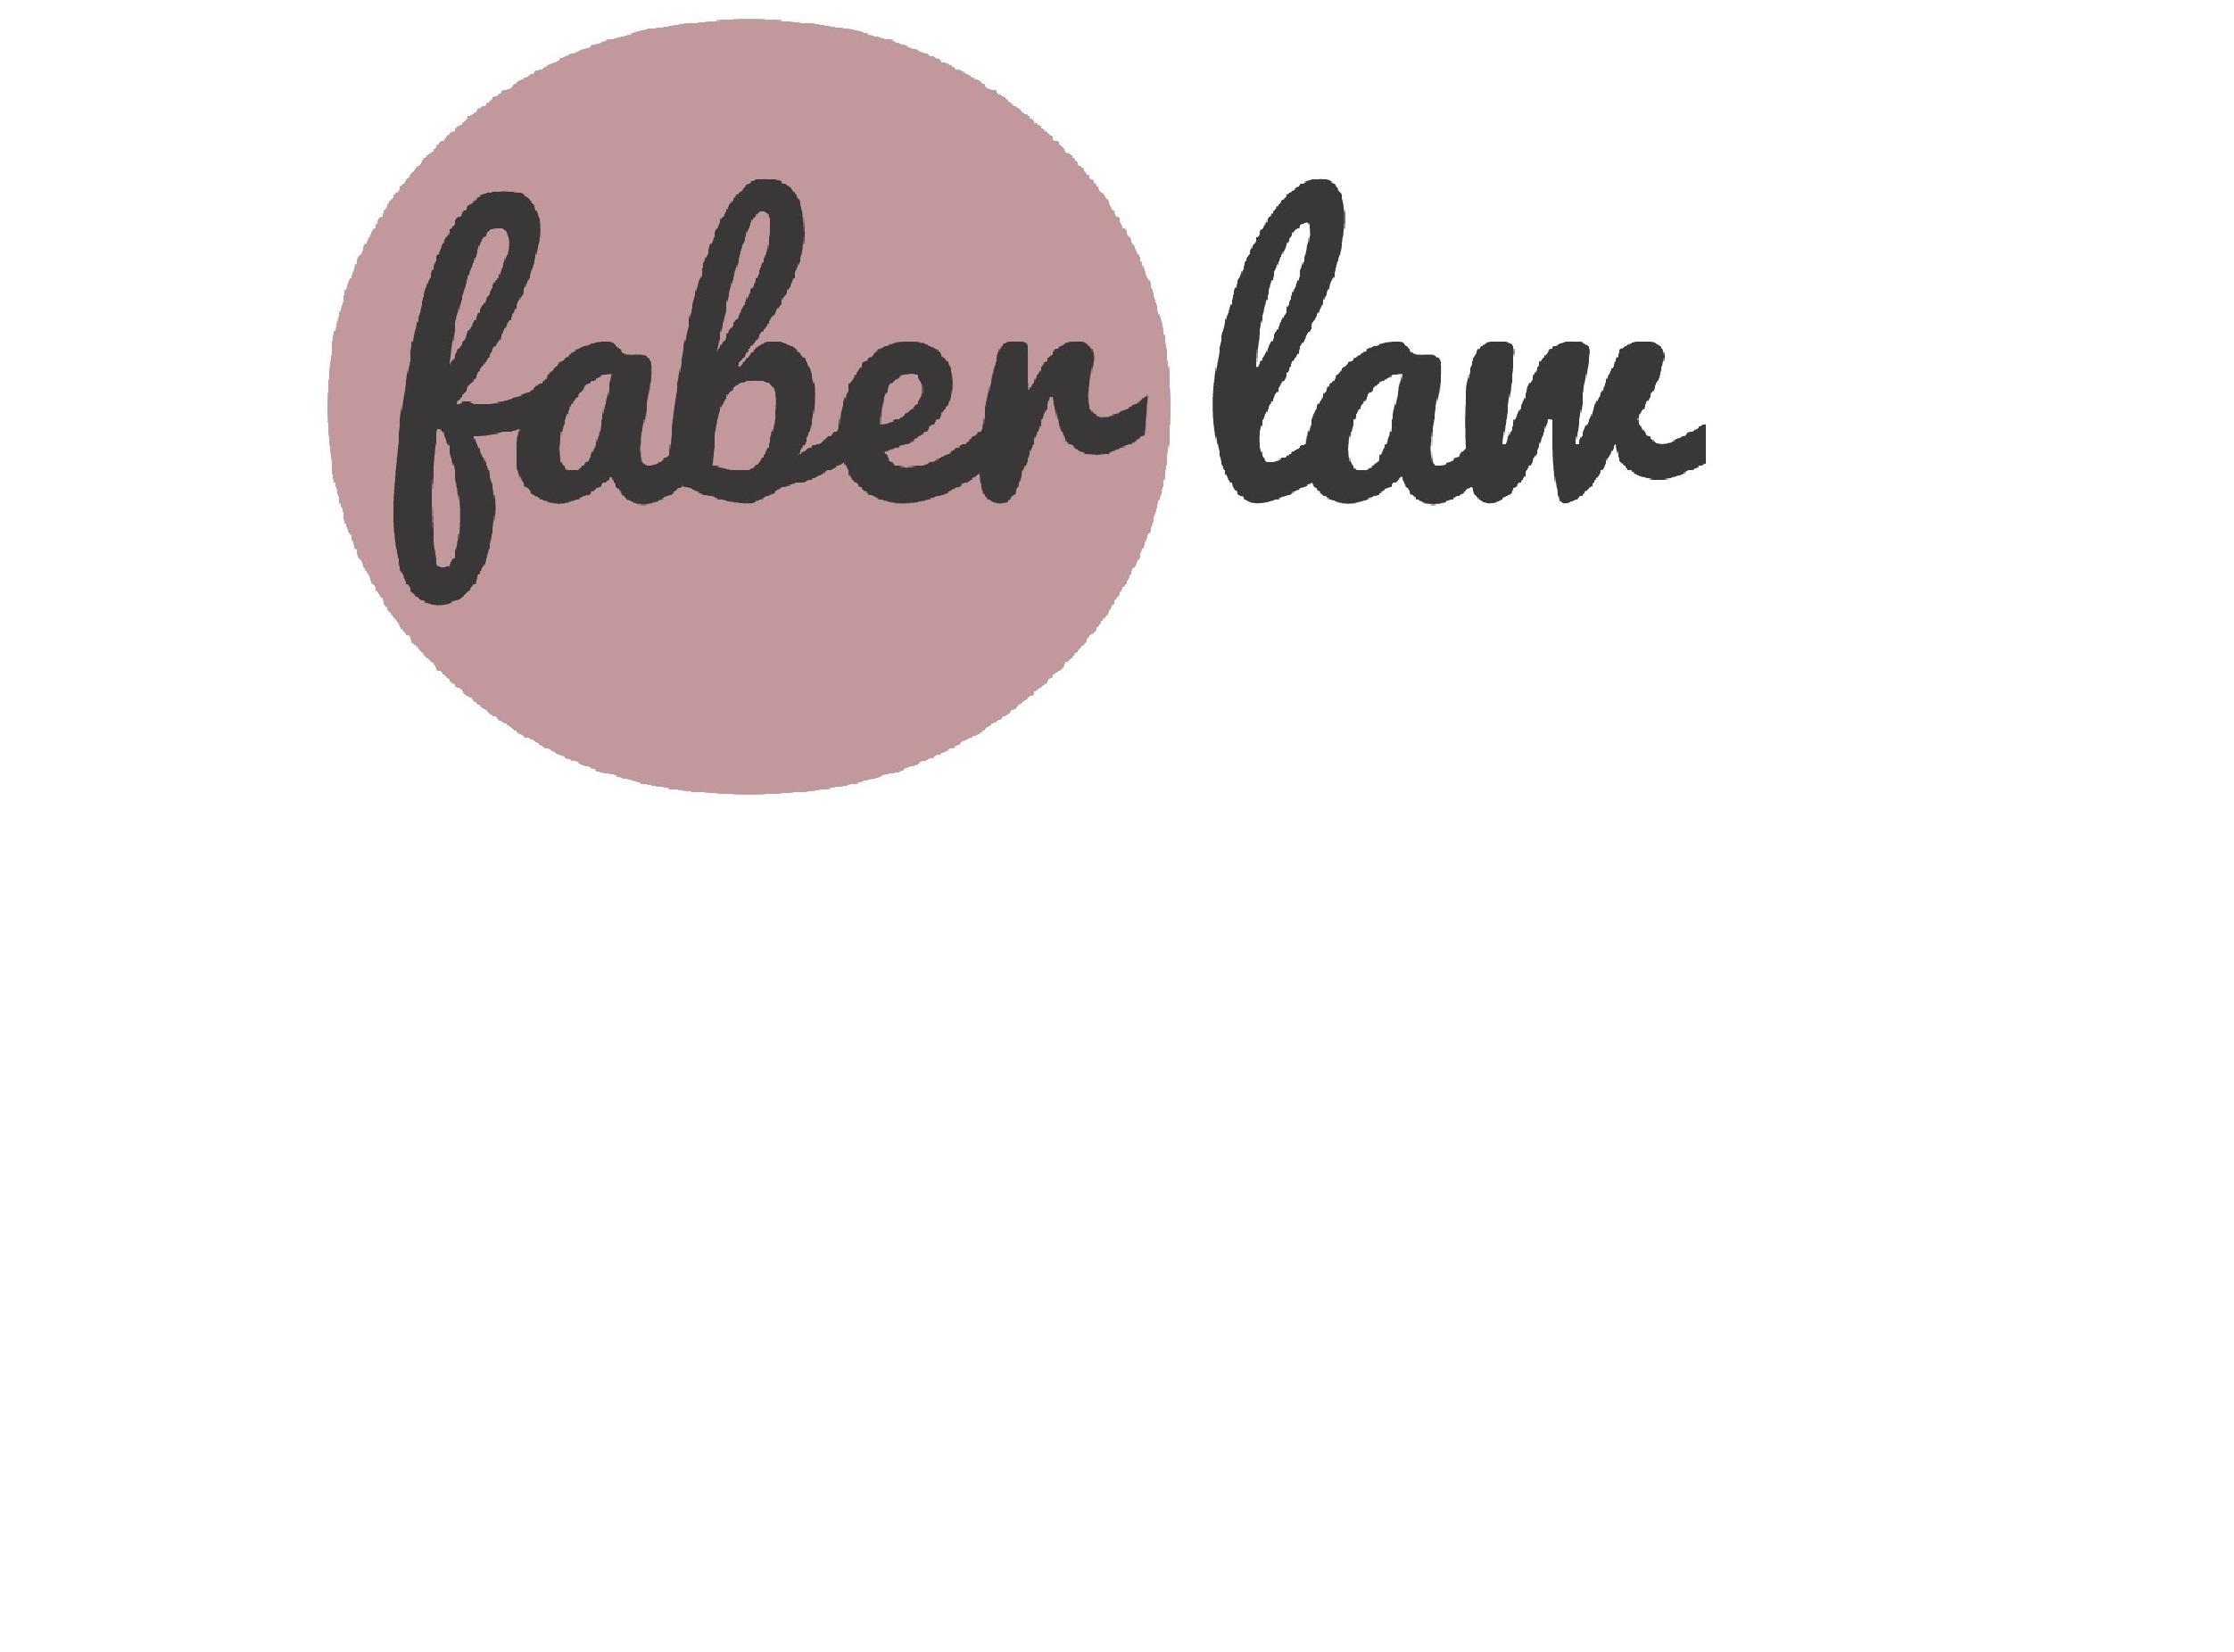 Faber Law Ltd.